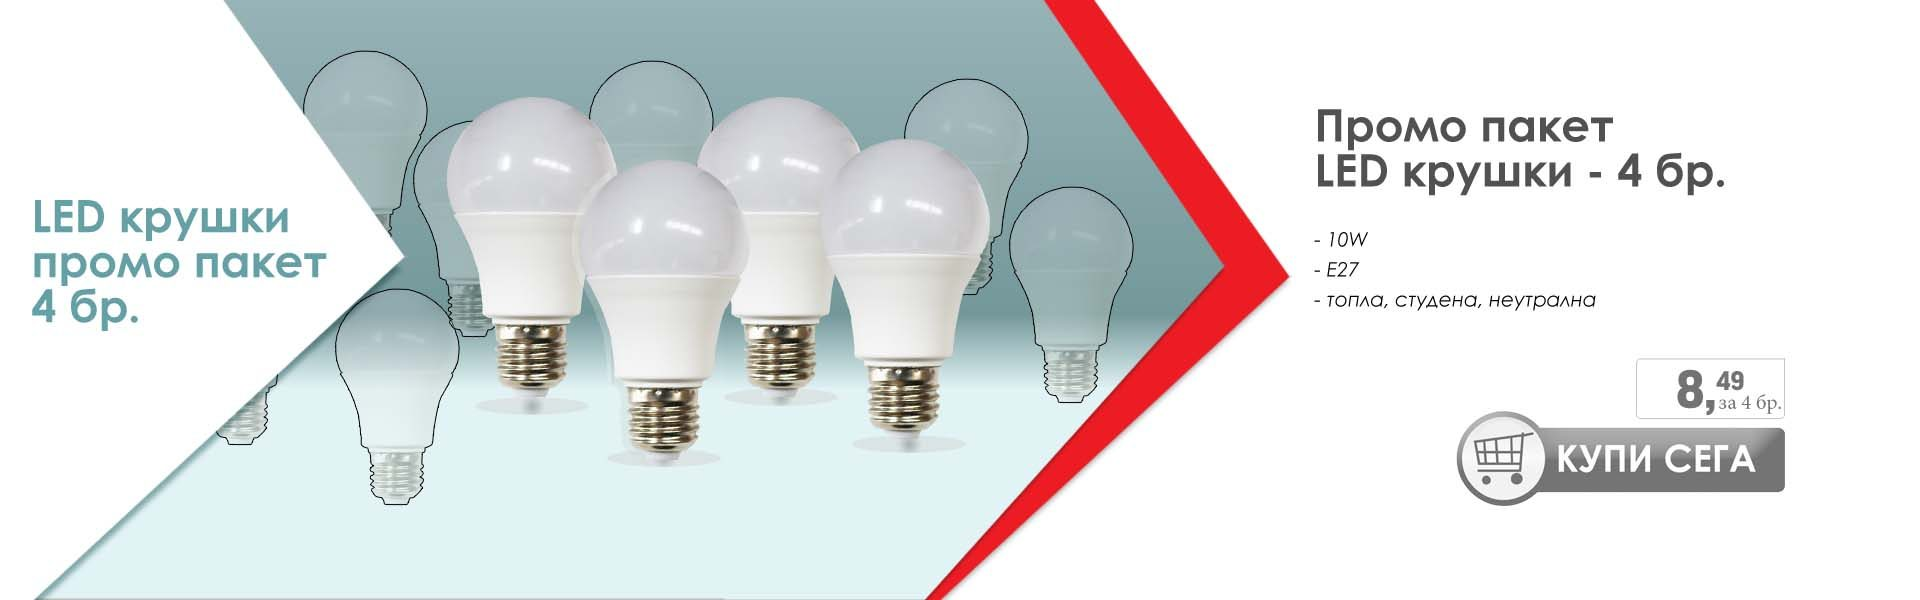 Пакет 4 бр LED крушка